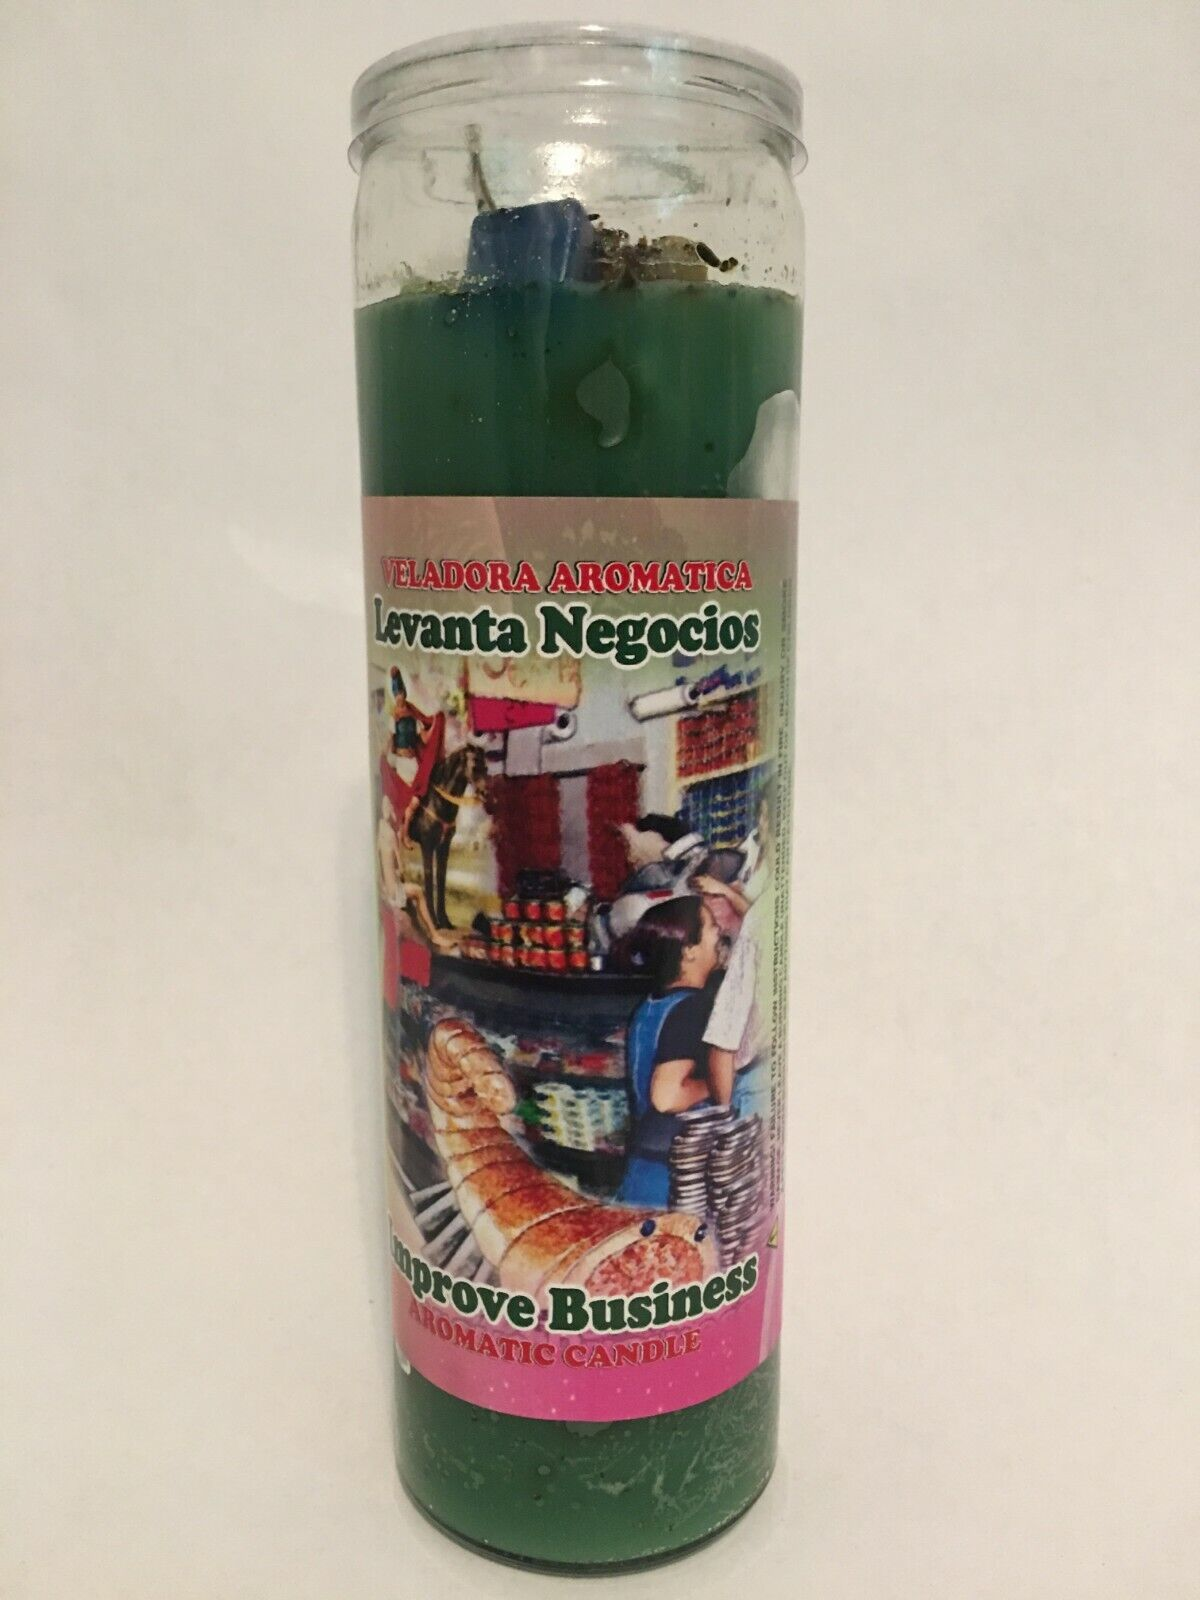 Improve Business Aromatic Candle 7 DAY GLASS CANDLE Levanta veladora aromatica